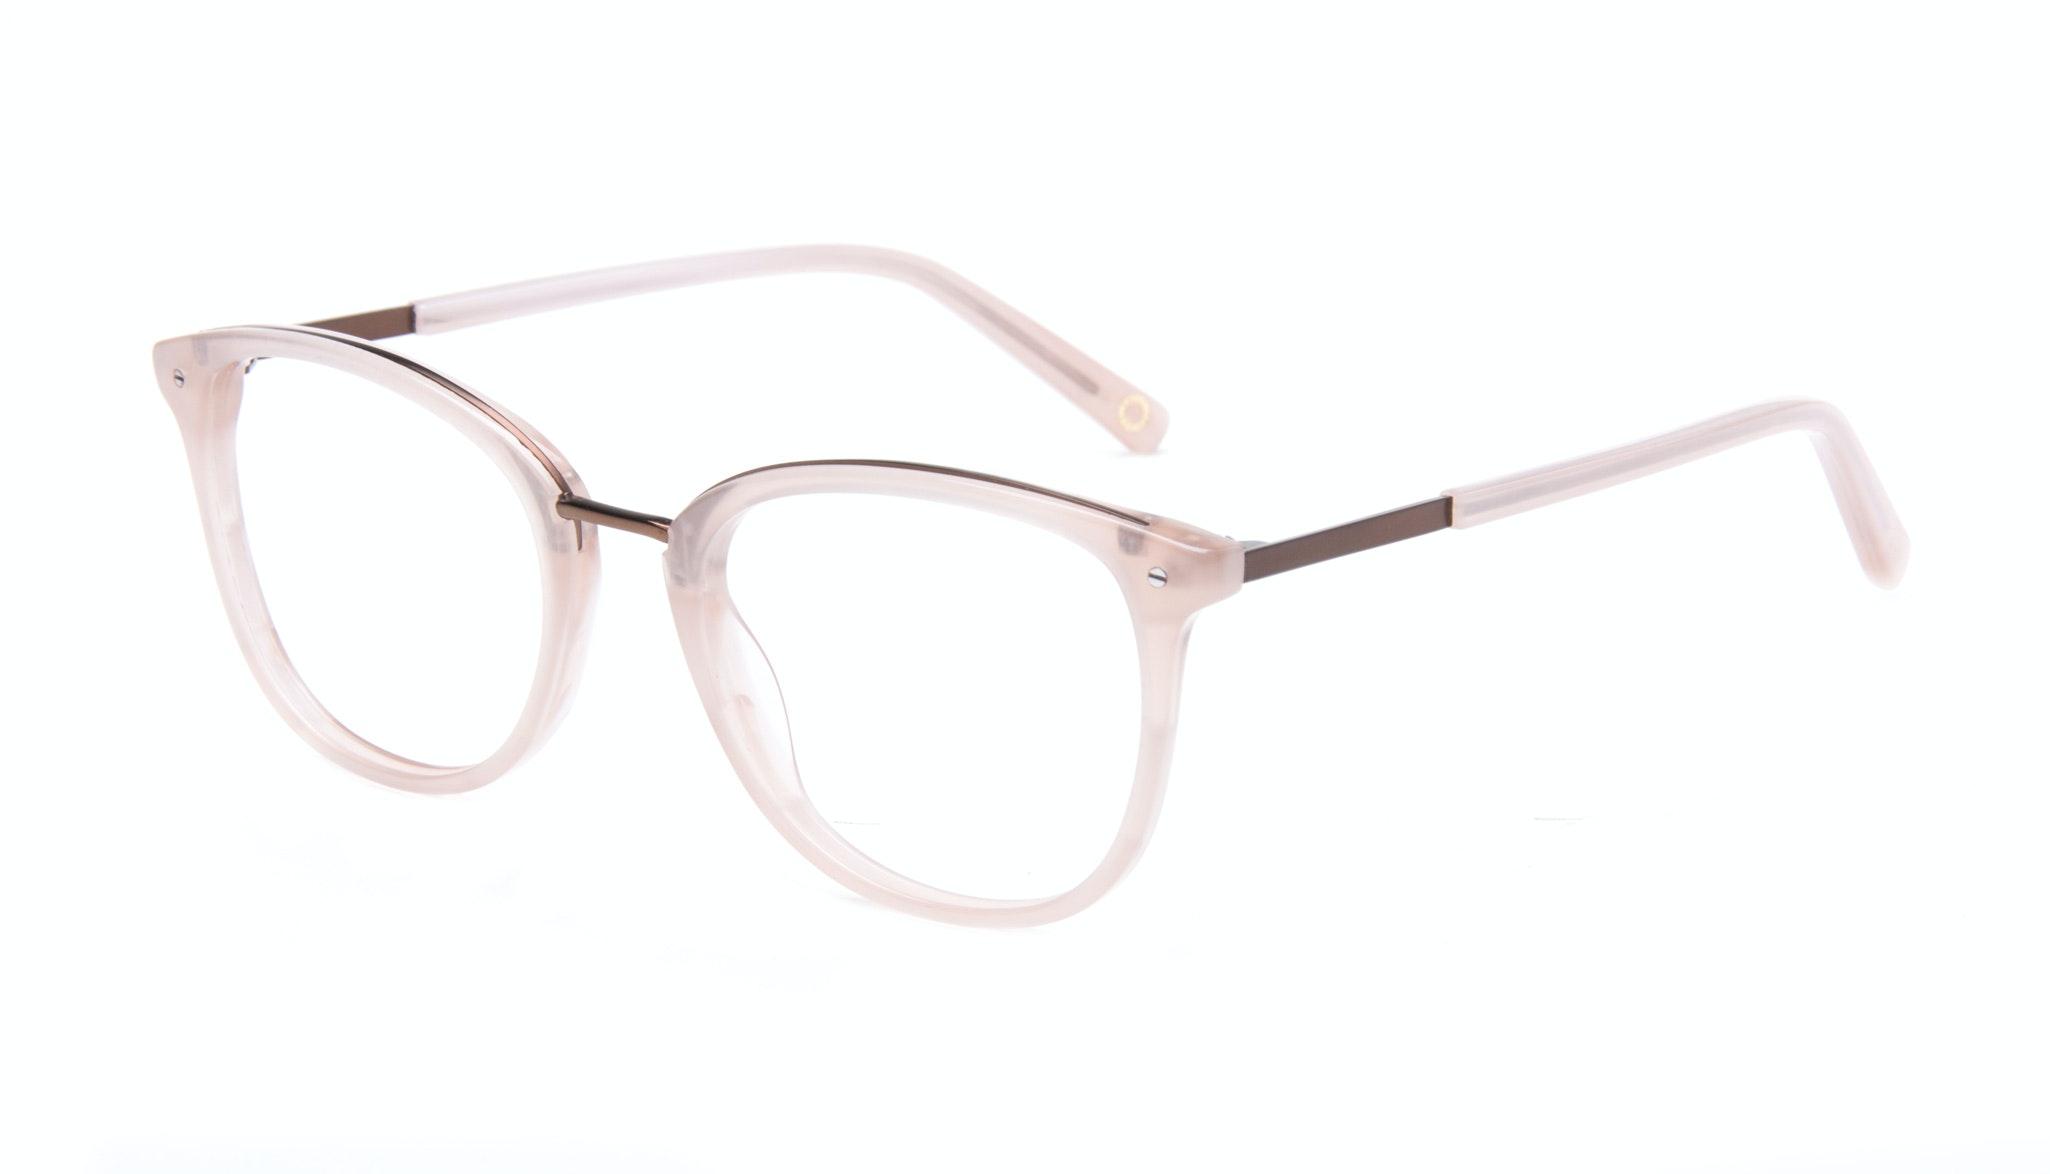 Affordable Fashion Glasses Square Round Eyeglasses Women Bella Blush Tilt